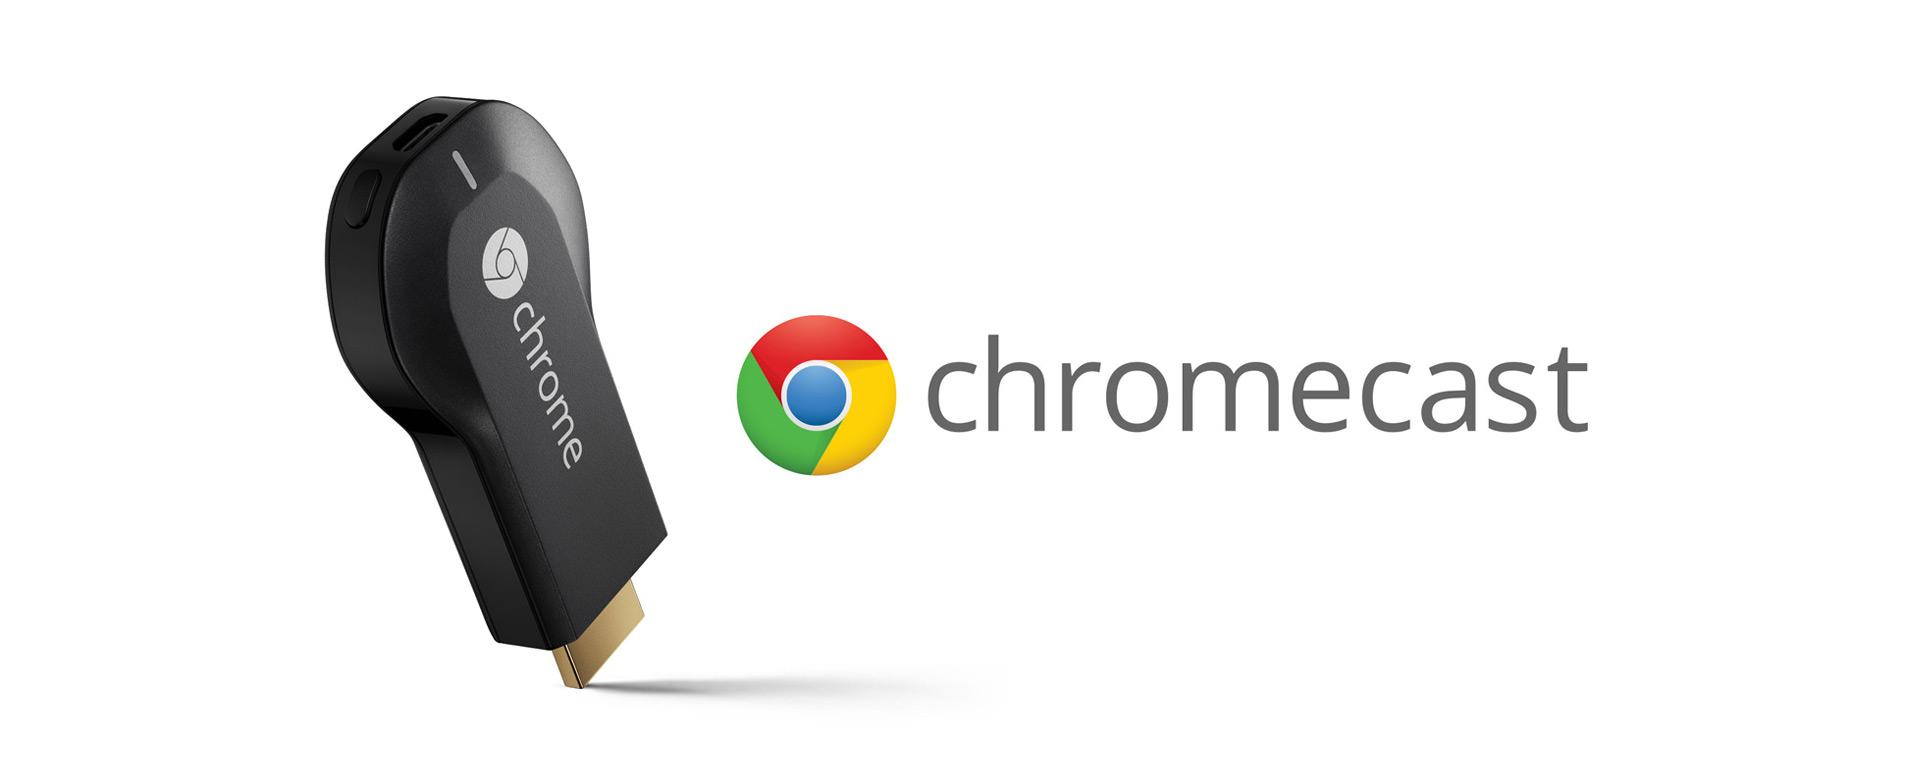 Top 10 Reasons You Need a Chromecast! | Harvey Norman Australia